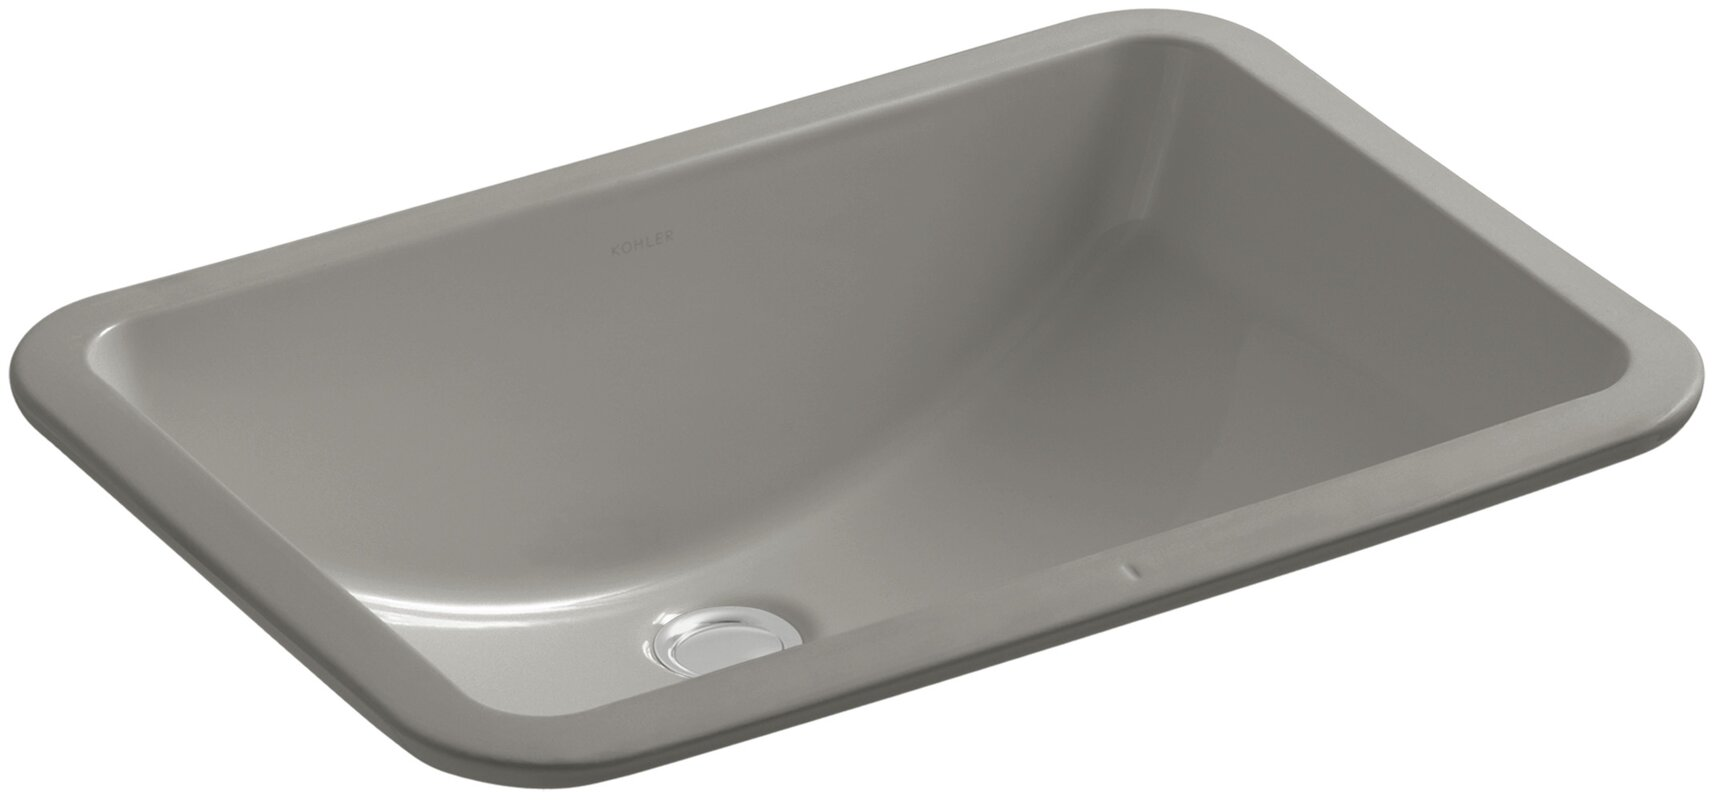 Grey Undermount Bathroom Sink kohler ladena rectangular undermount bathroom sink & reviews | wayfair